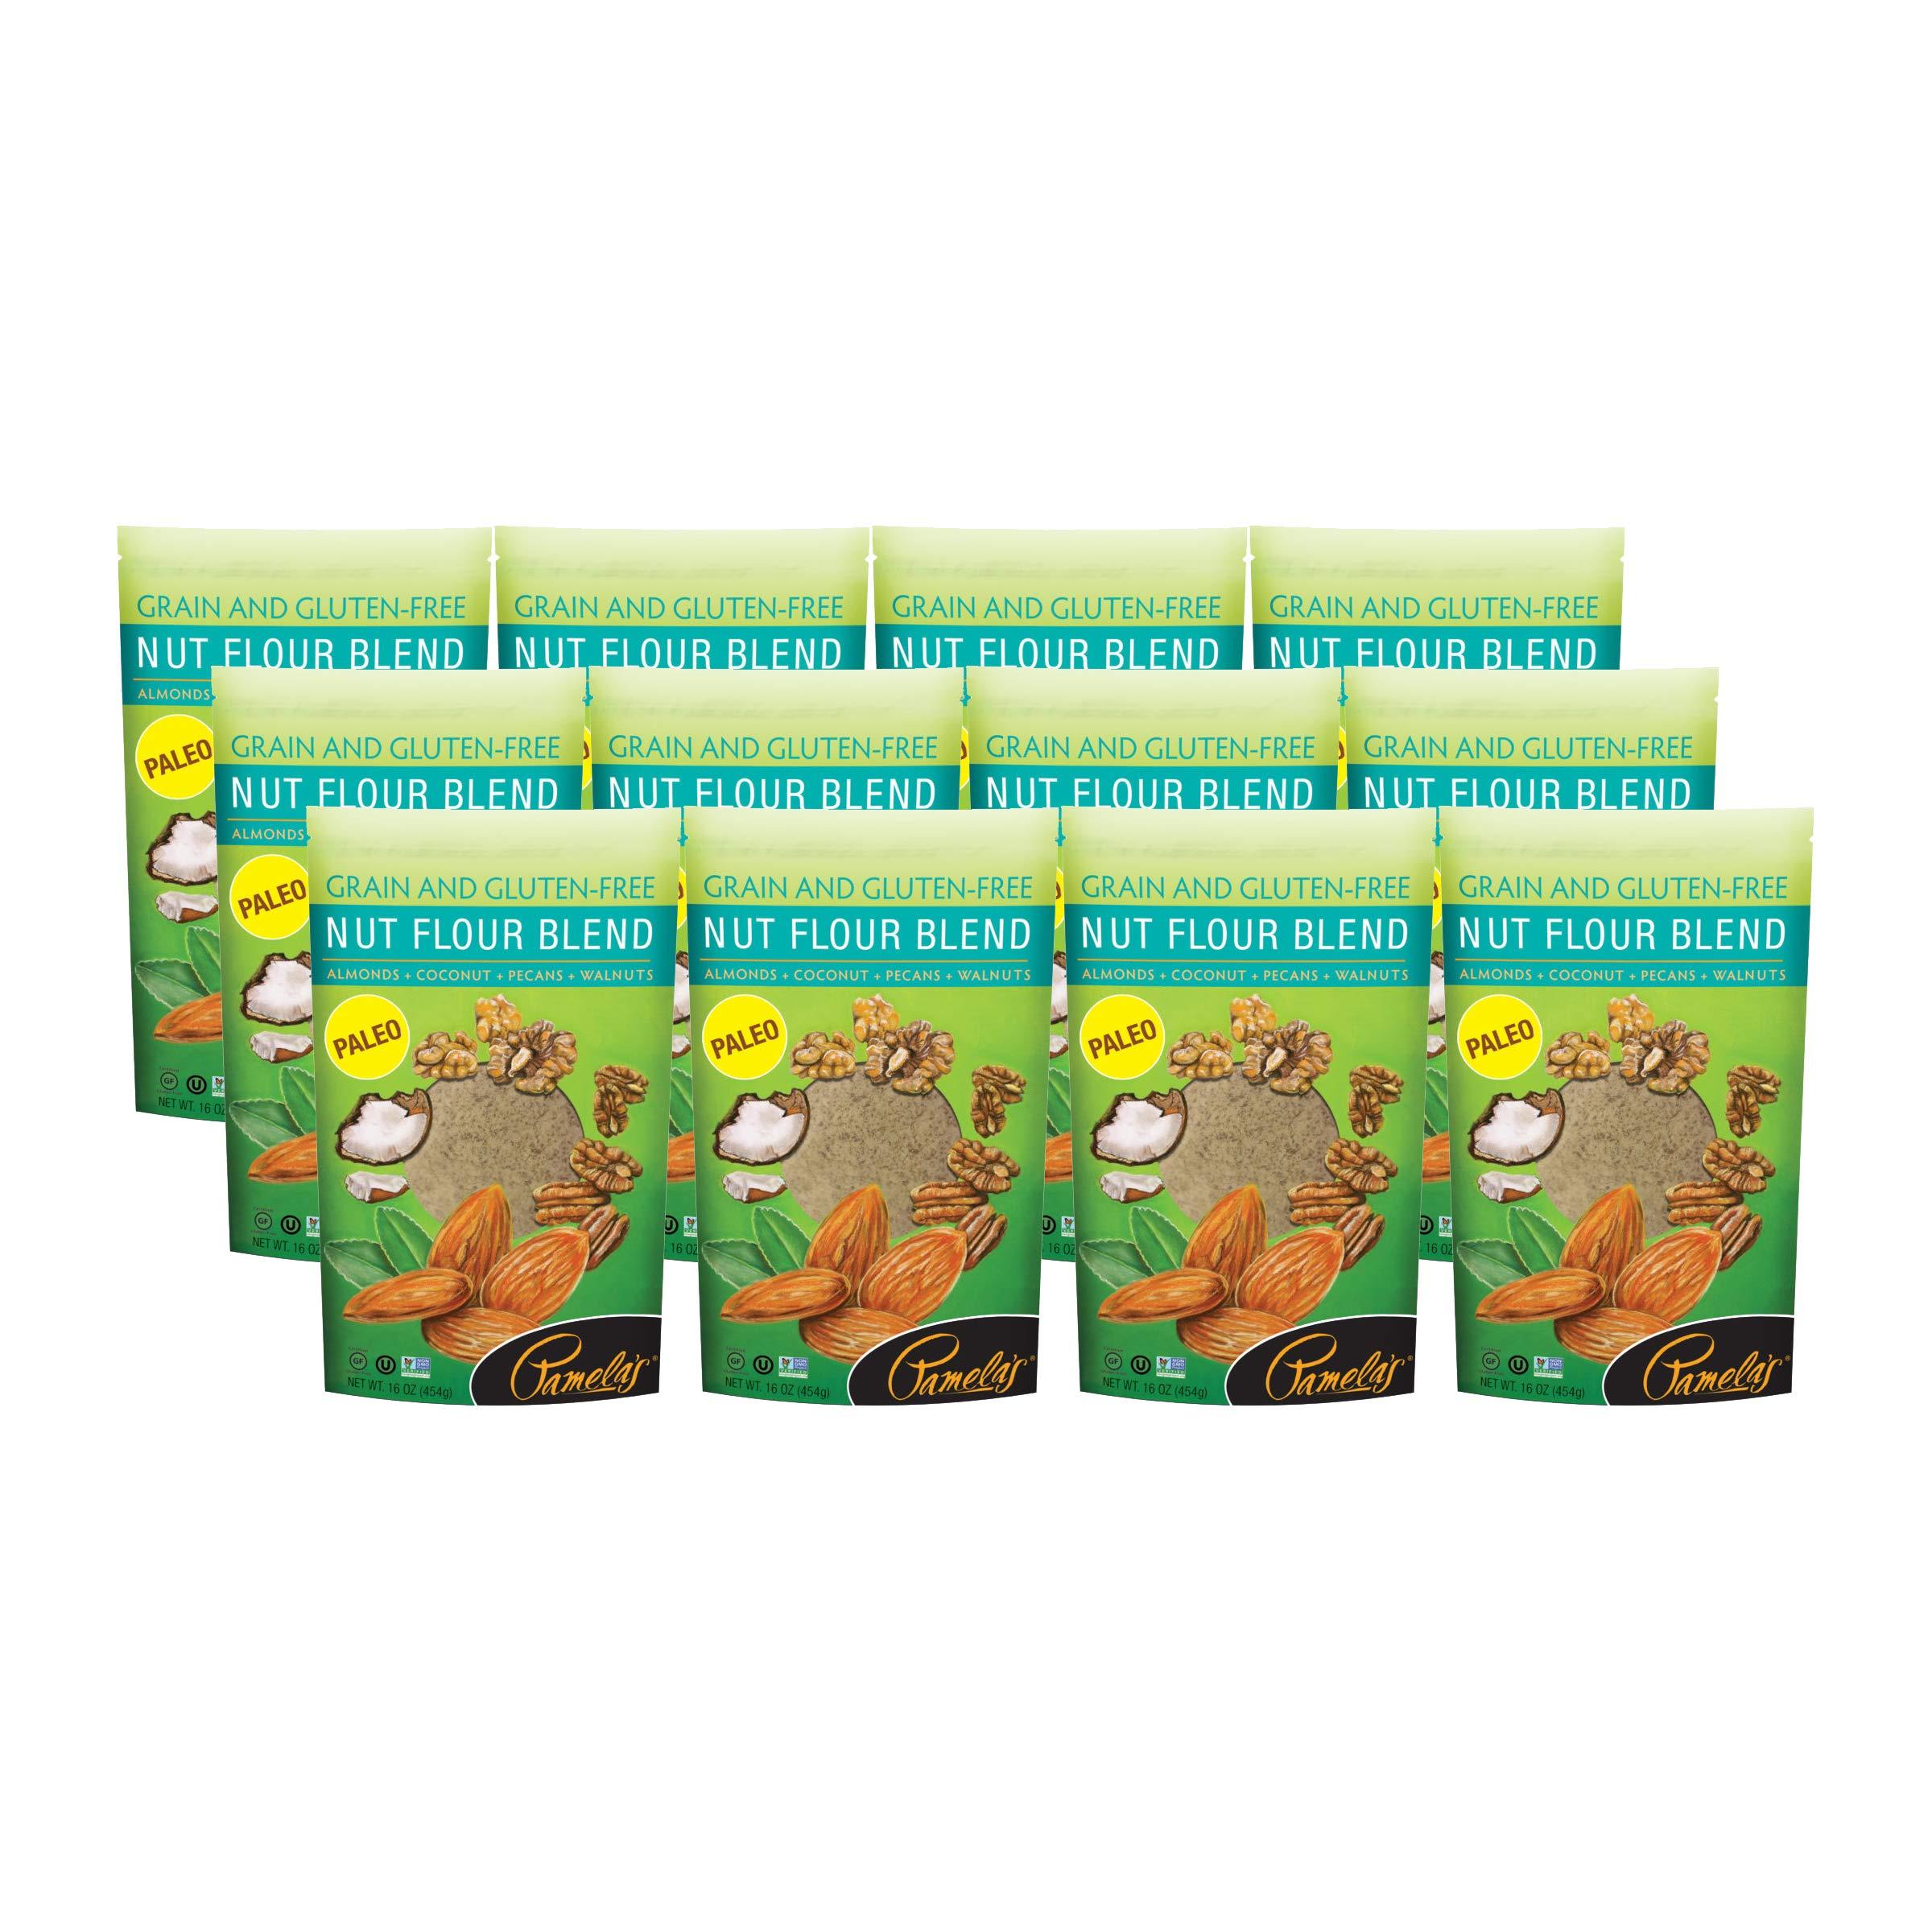 Pamela's Organic Grain-Free Gluten Free Paleo Flour (Nut Blend Flour, Pack - 12)